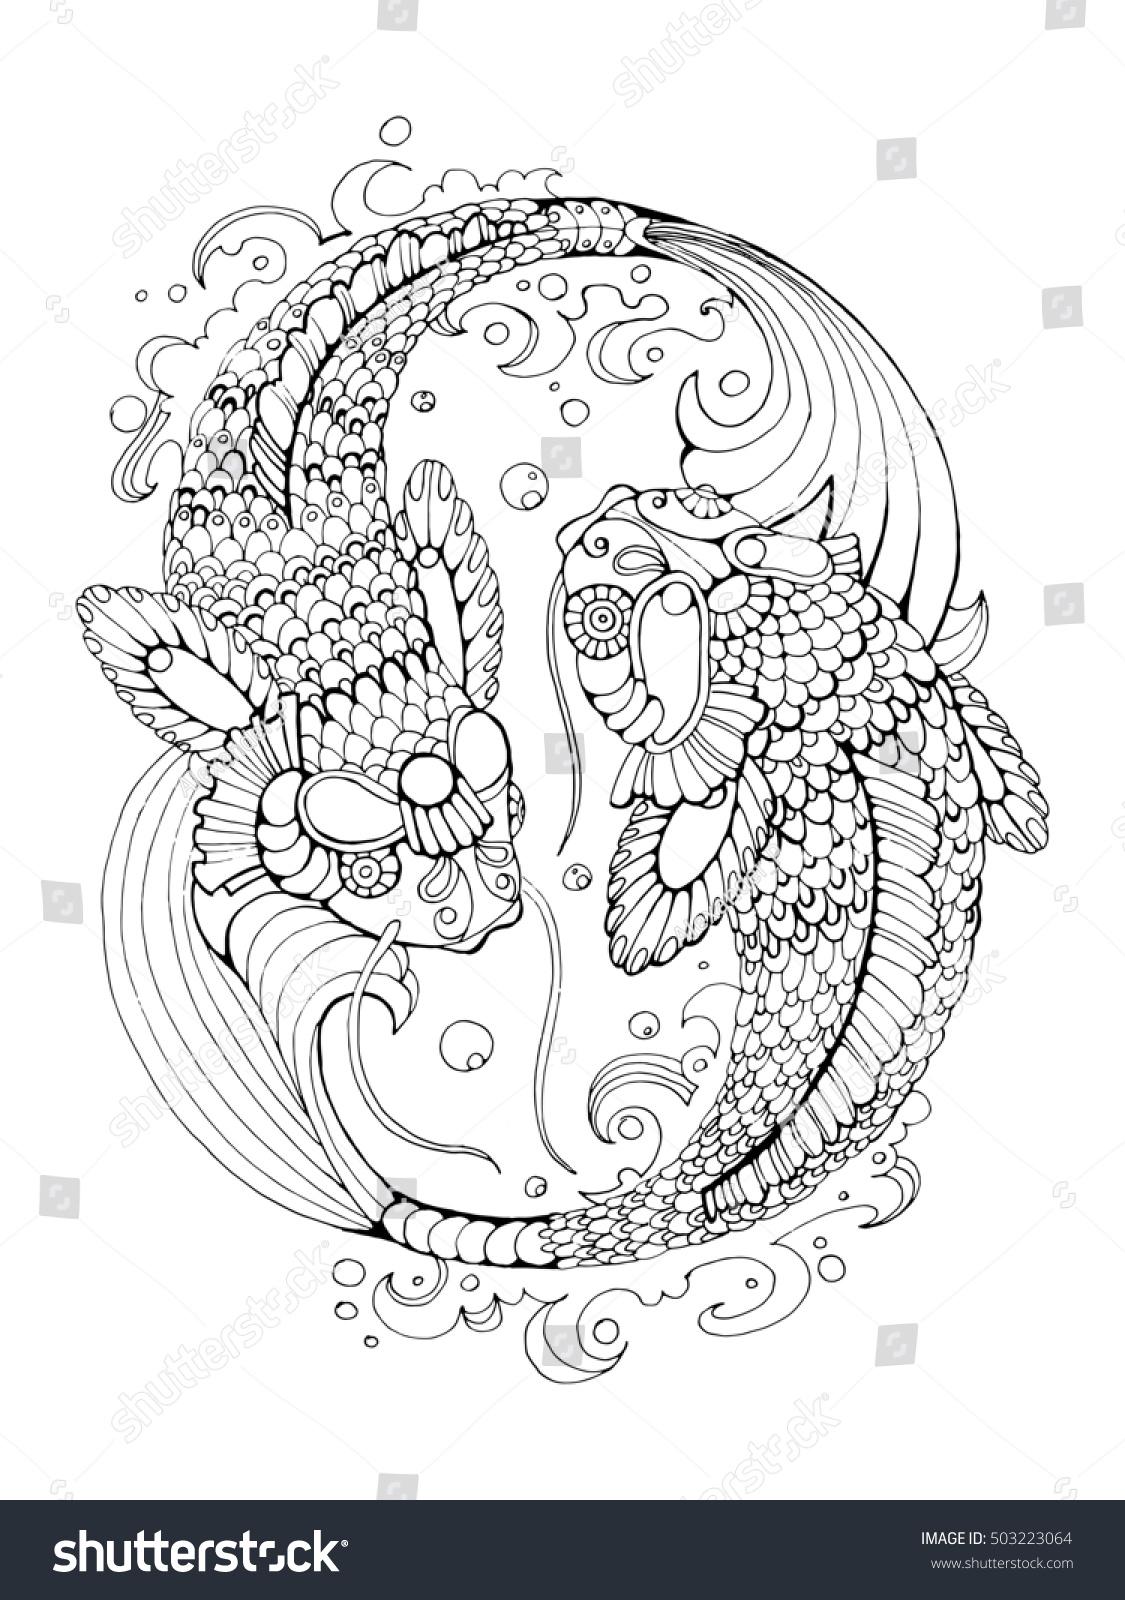 Koi Carp Fish Coloring Book For Adults Raster Illustration Anti Stress Adult